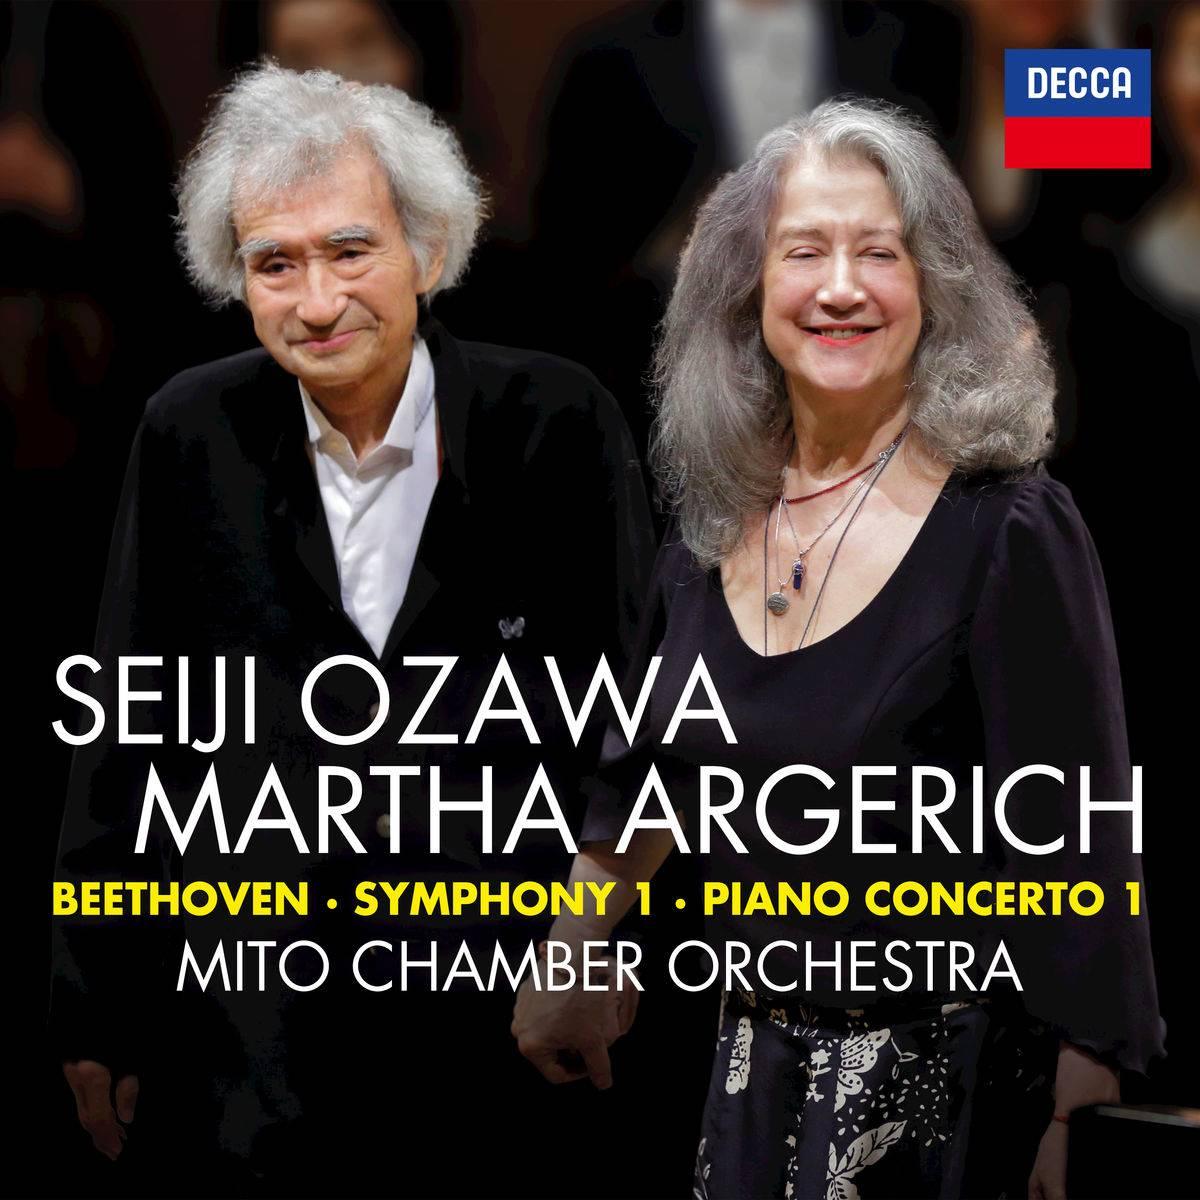 Martha Argerich, Seiji Ozawa & Mito Chamber Orchestra - Beethoven: Symphony No. 1 & Piano Concerto No. 1 (Live) (2018) [24/96]